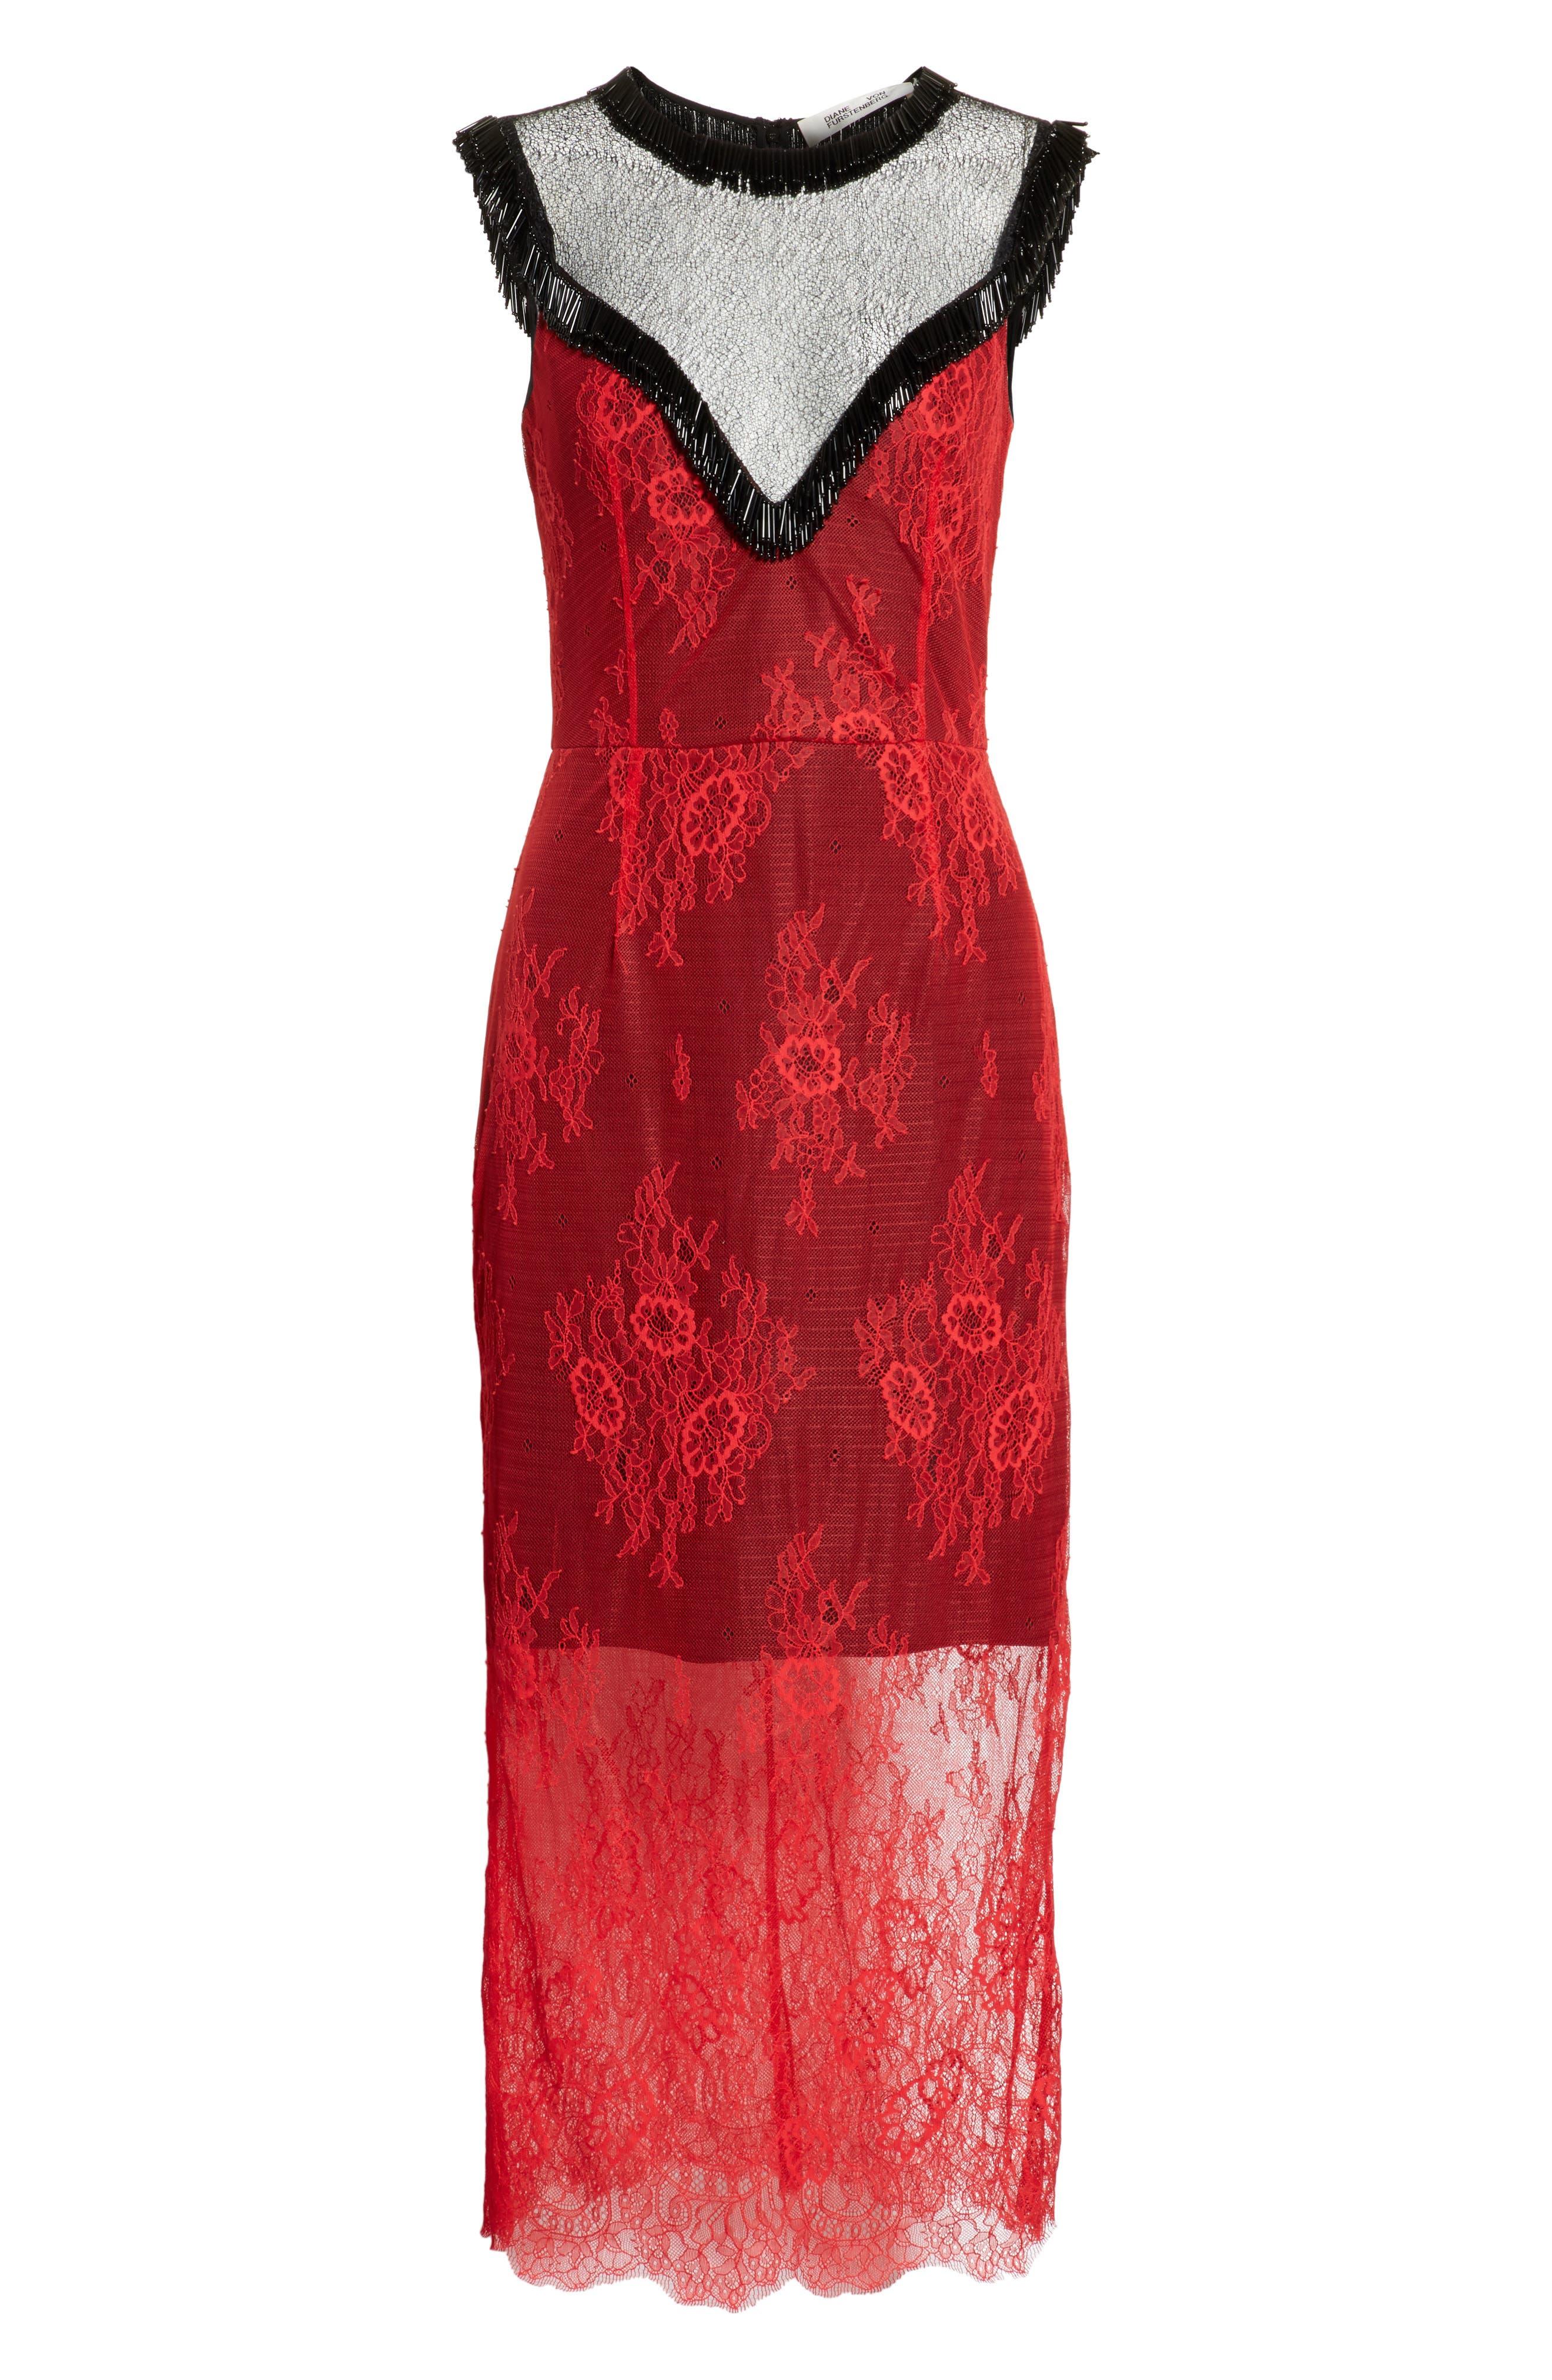 Diane von Furstenberg Beaded Lace Overlay Dress,                             Alternate thumbnail 6, color,                             Lipstick/ Black